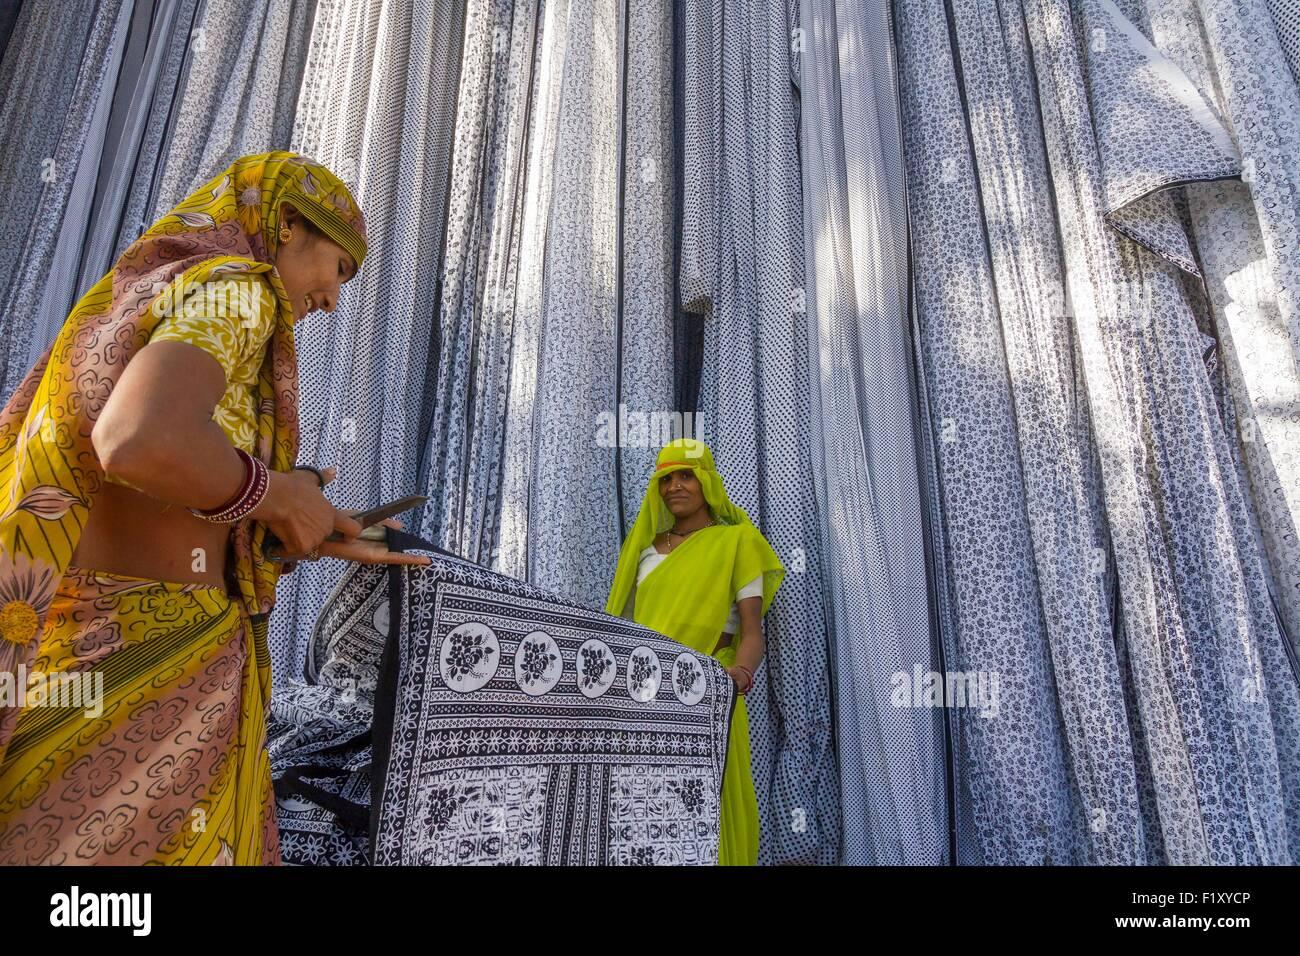 India, Rajasthan State, Sanganer, textile factory, cutting textiles - Stock Image